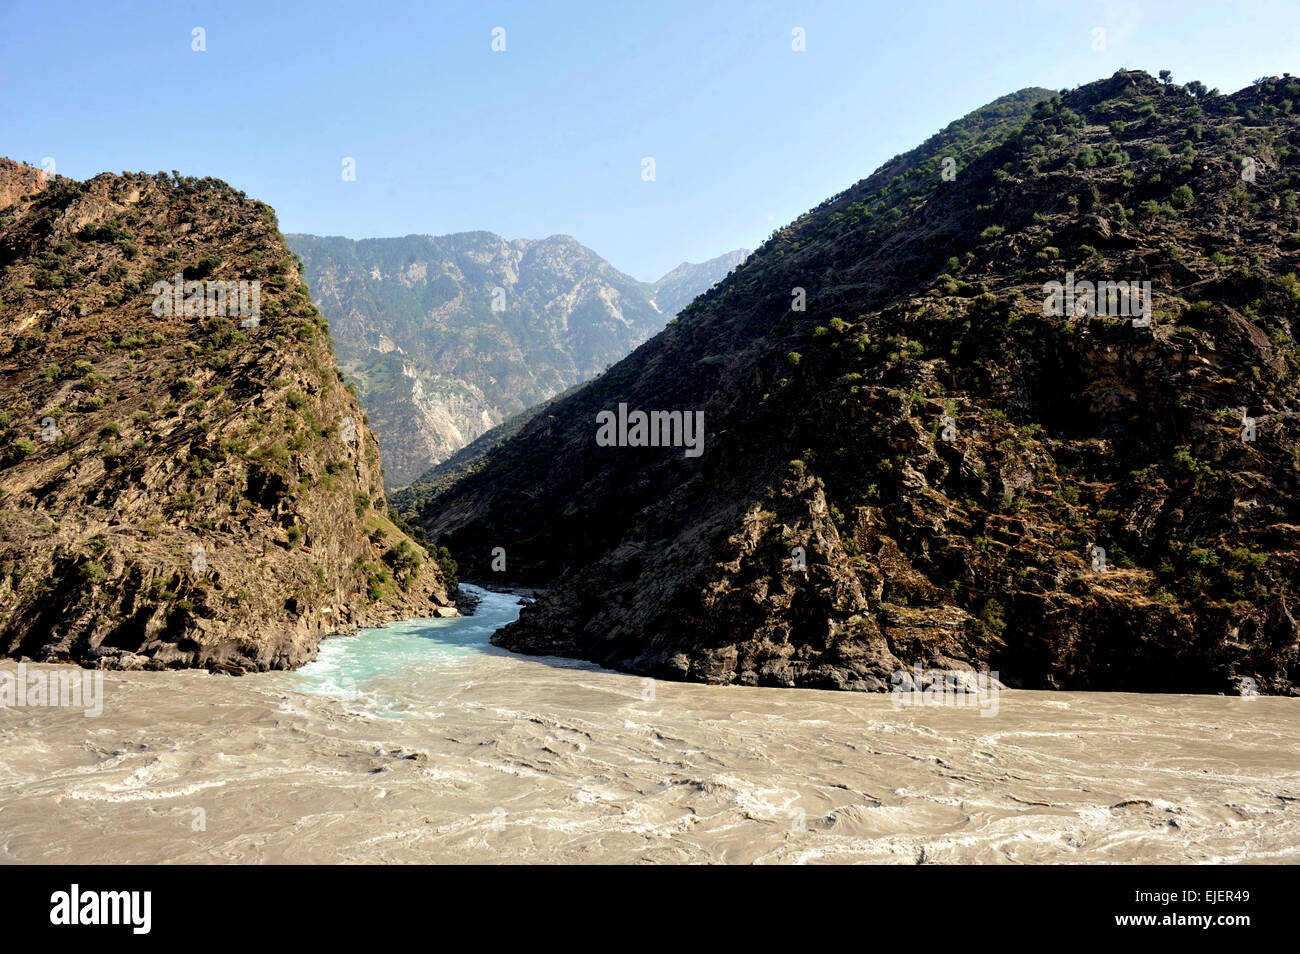 Hunza river, Karakoram Highway ,Pakistan, Gilgit, Baltistan,Gilgit-Baltistan, Hunza River, Pakistan, 2010. - Stock Image